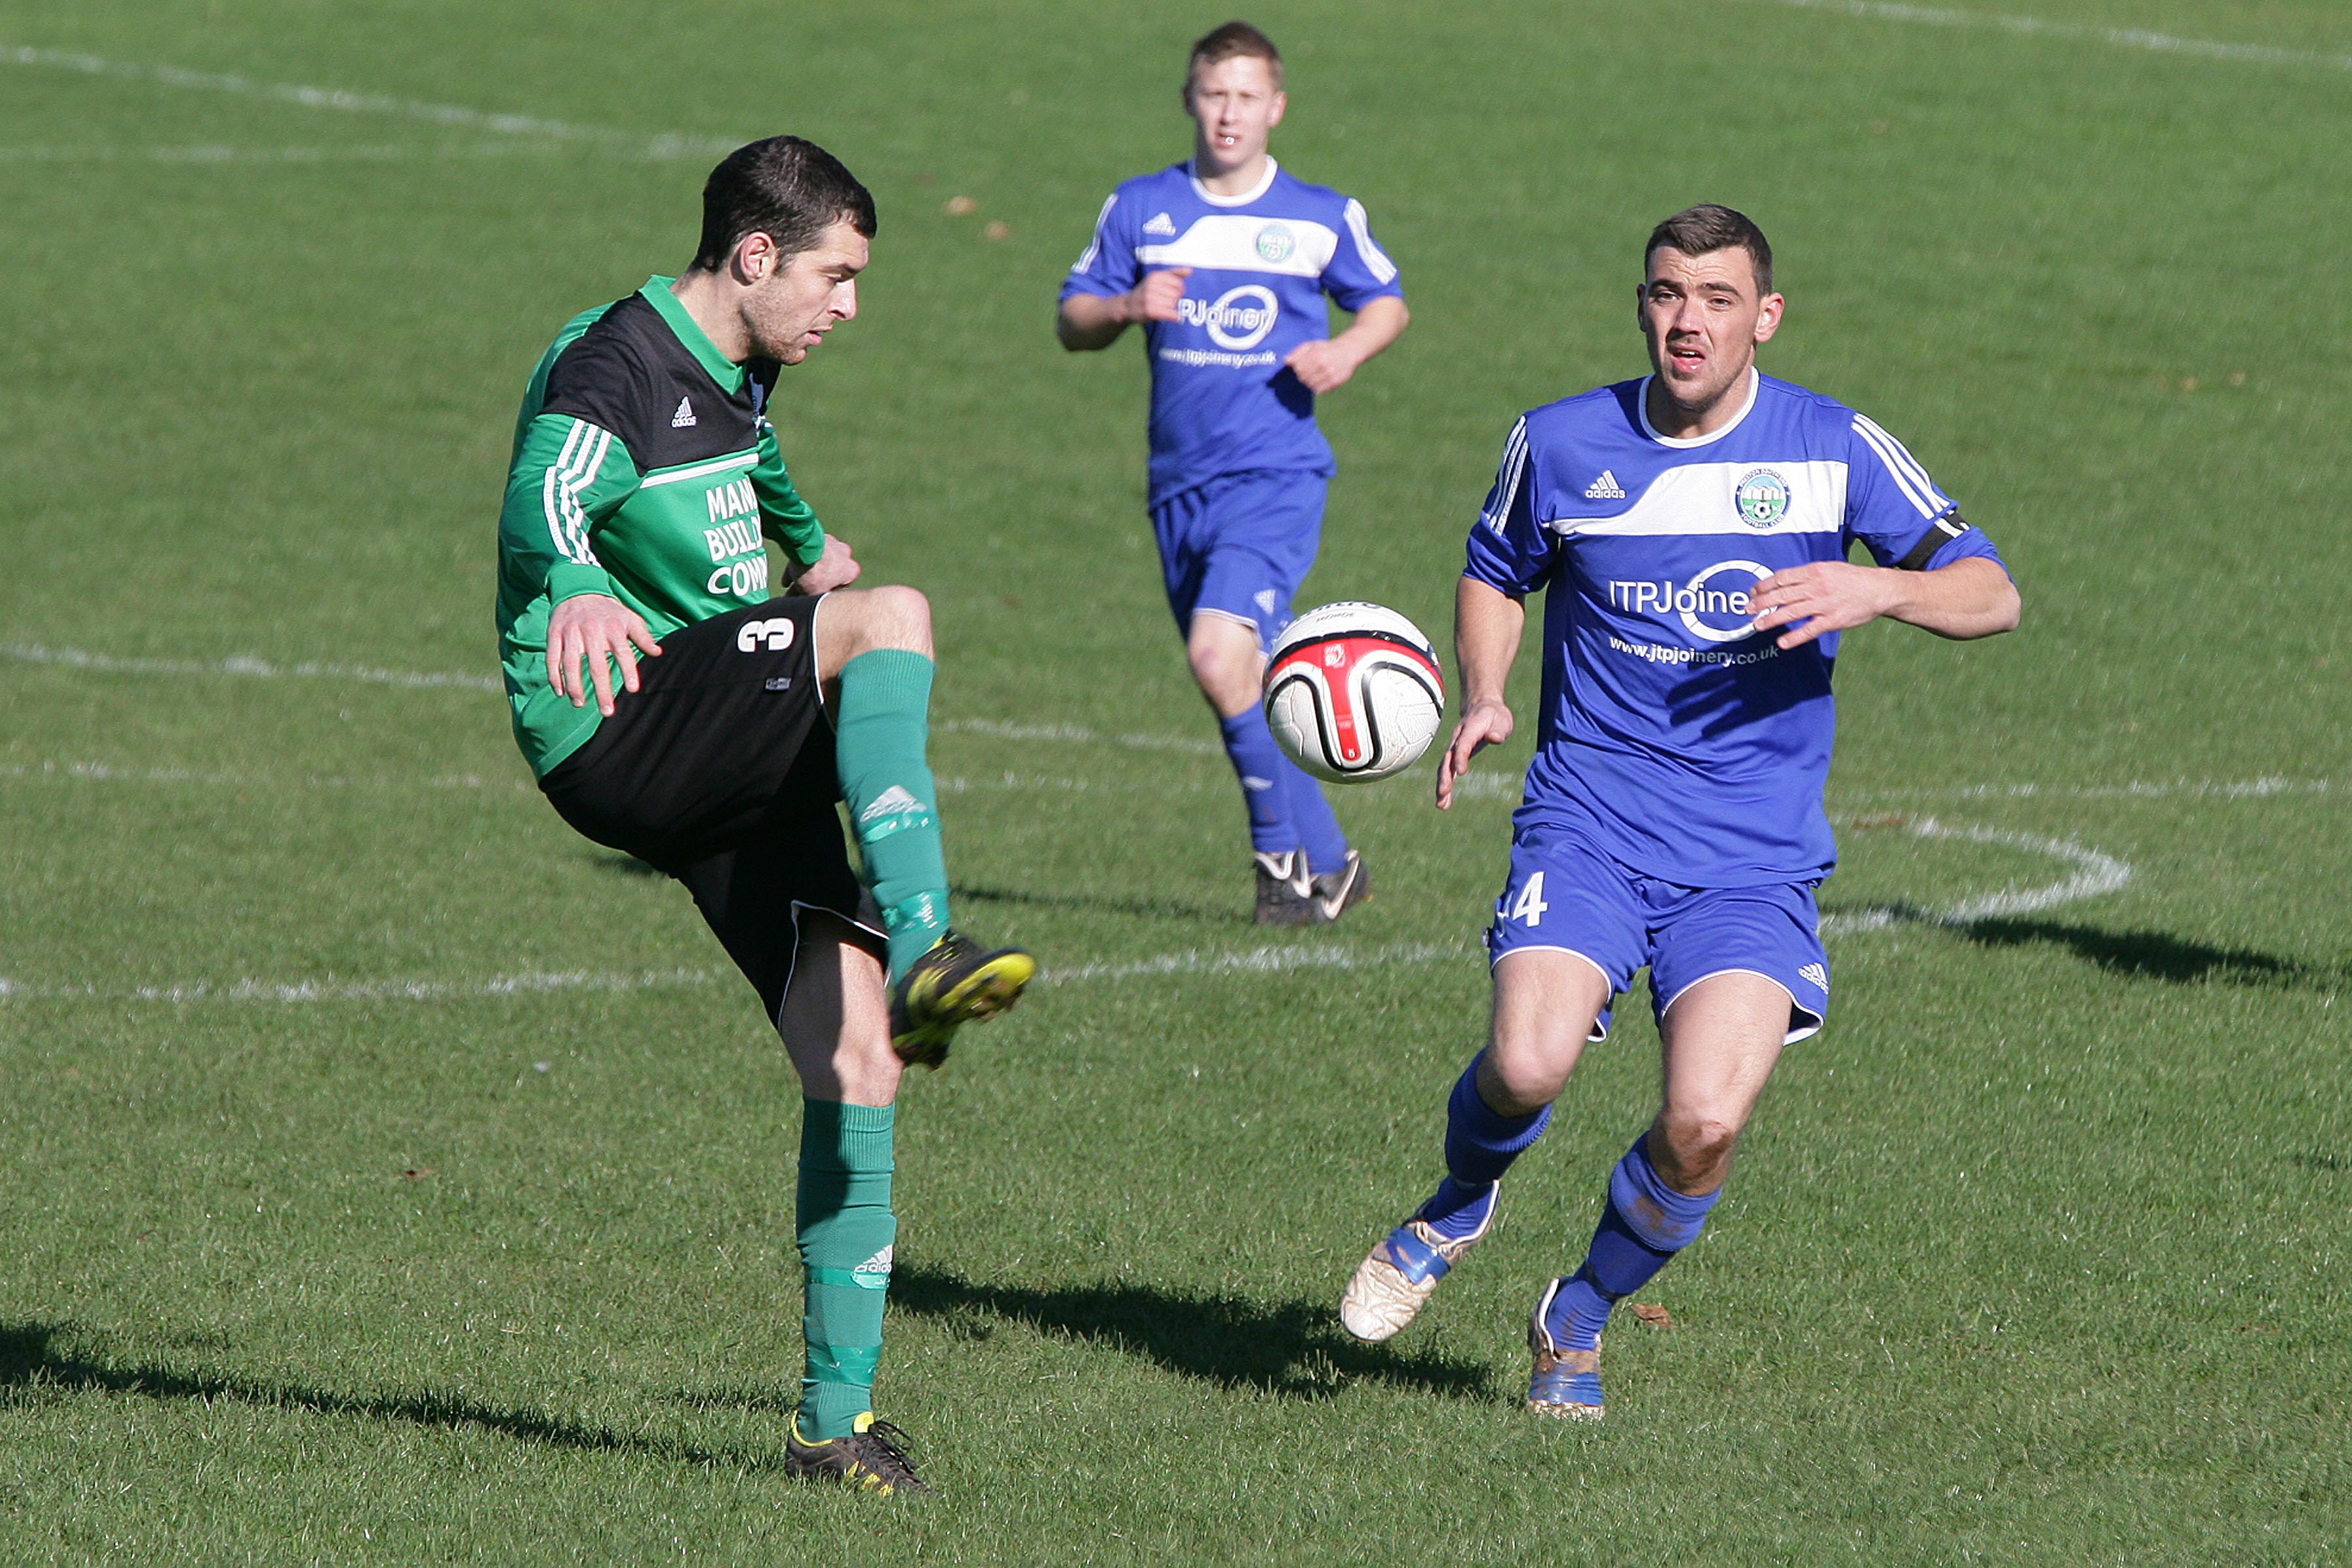 Lewis Woodmore Darren Munday Watcombe Wanderers Preston South End Herald Cup SDFL Sport South Devon